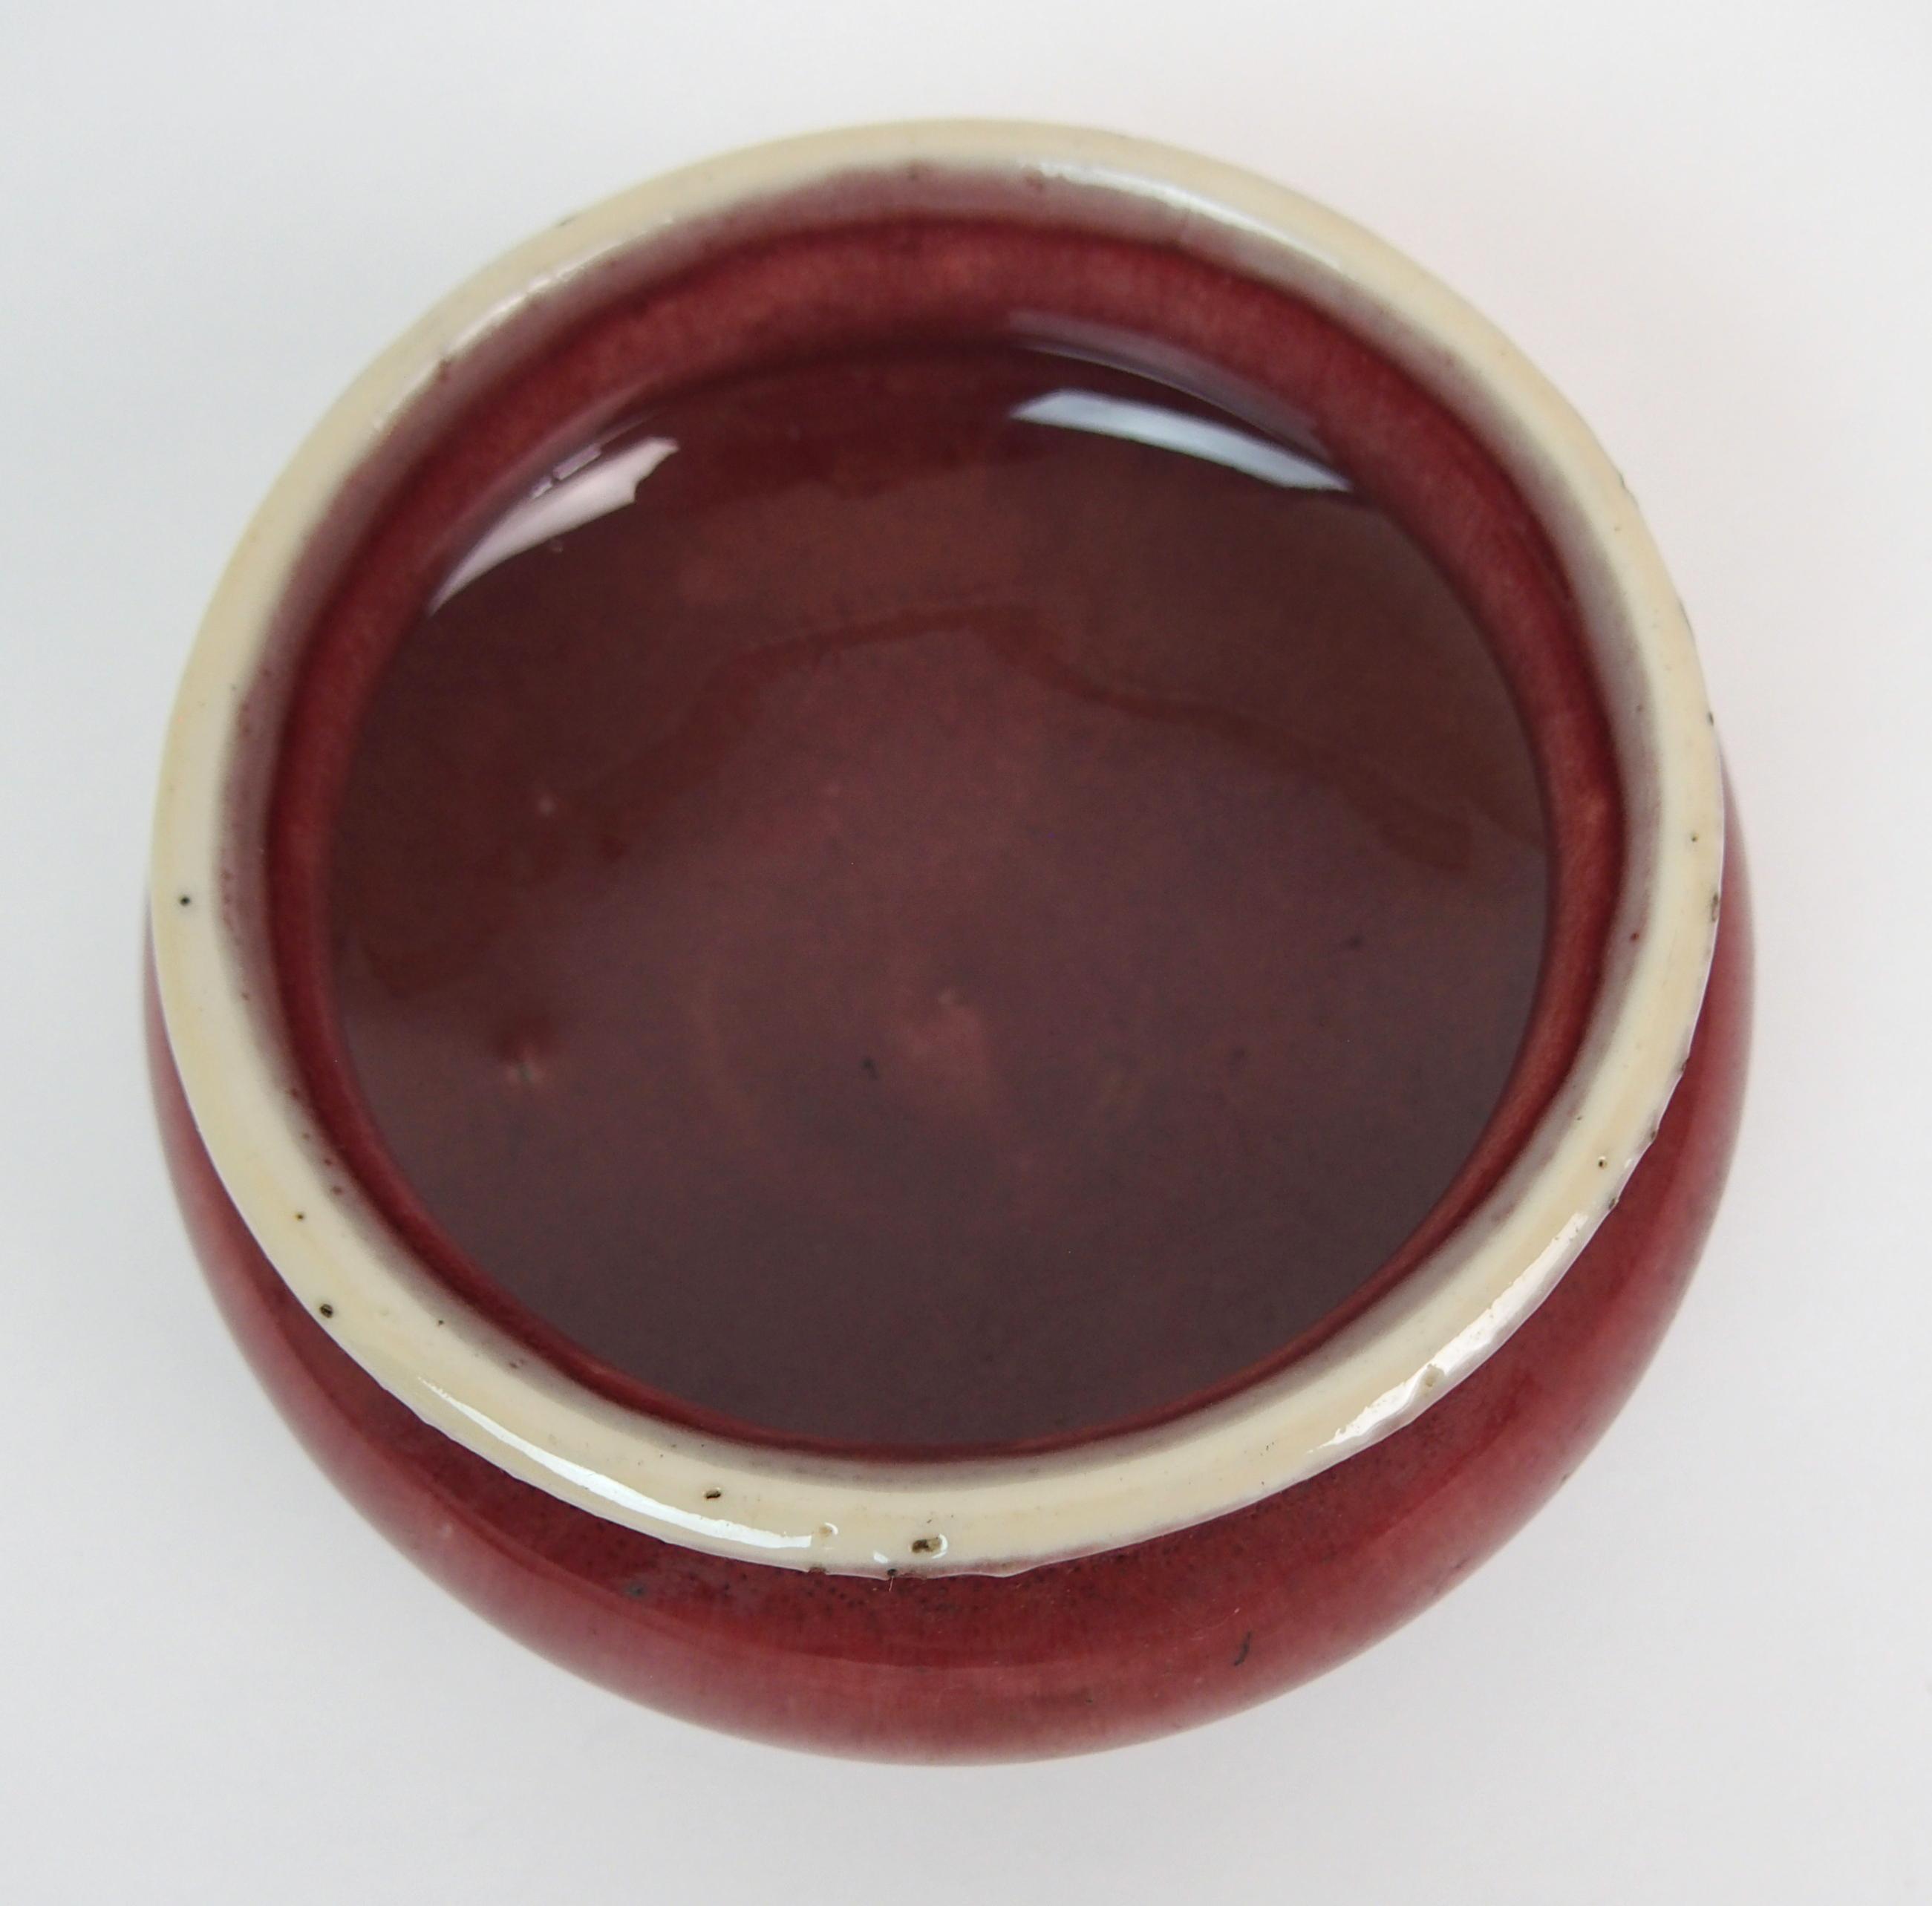 Lot 13 - A CHINESE MONOCHROME CENSER on tripod bases, 11cm diameter, blue and white saucer, 18cm diameter,